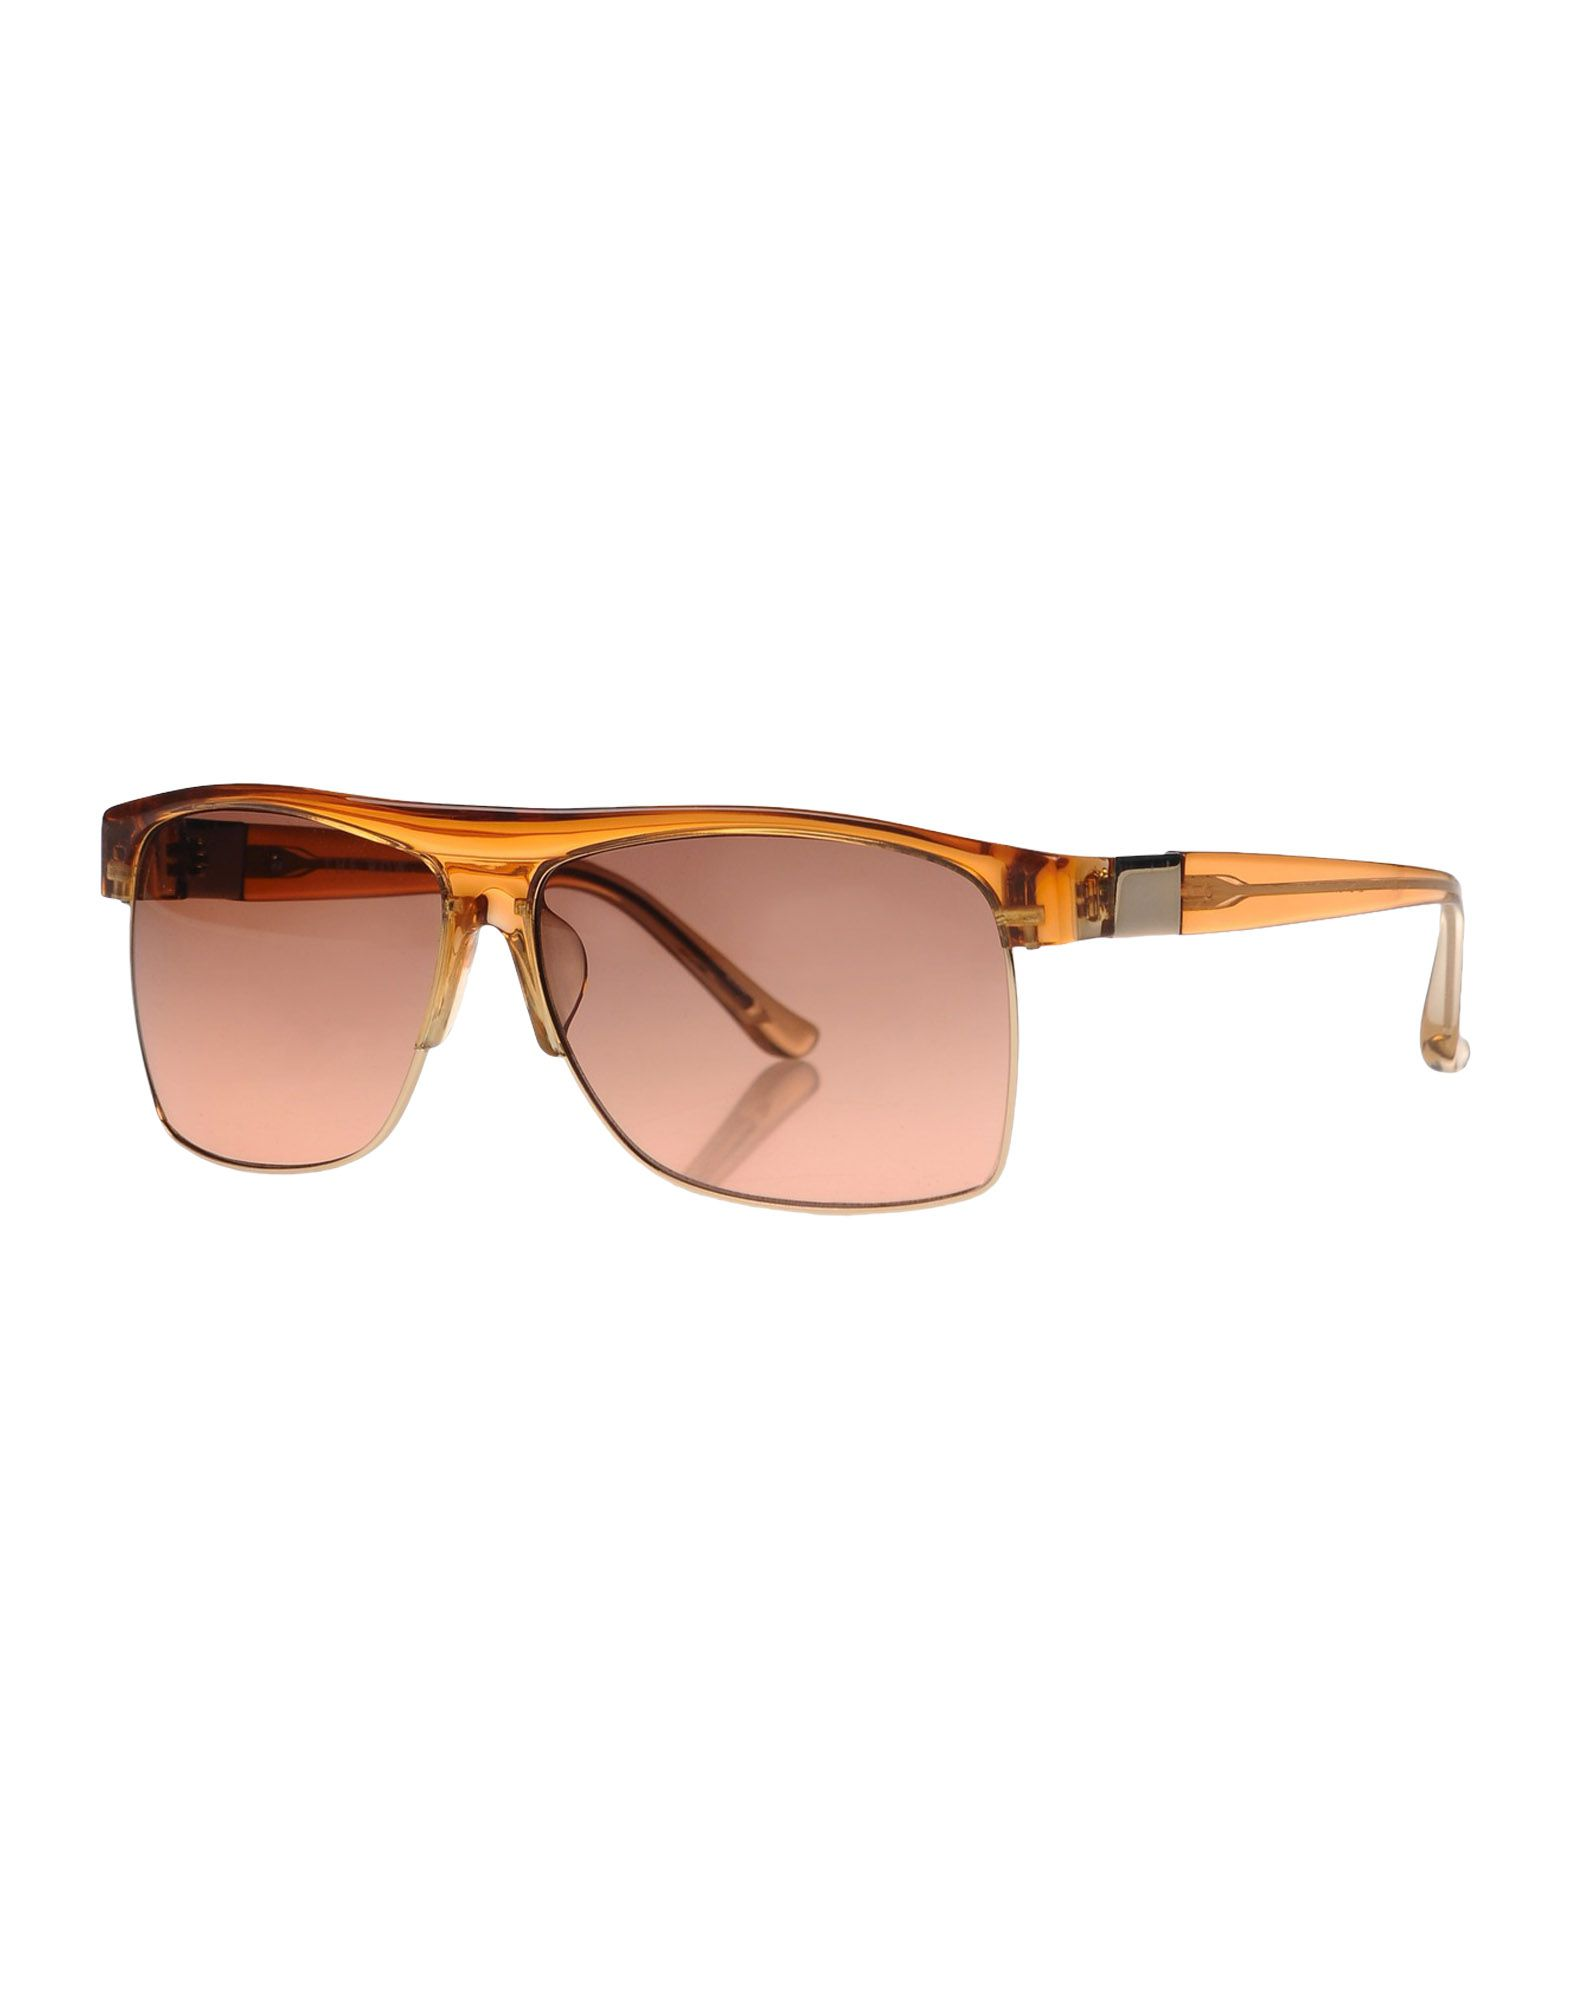 THE ROW BY LINDA FARROW Солнечные очки linda farrow with matthew williamson солнечные очки